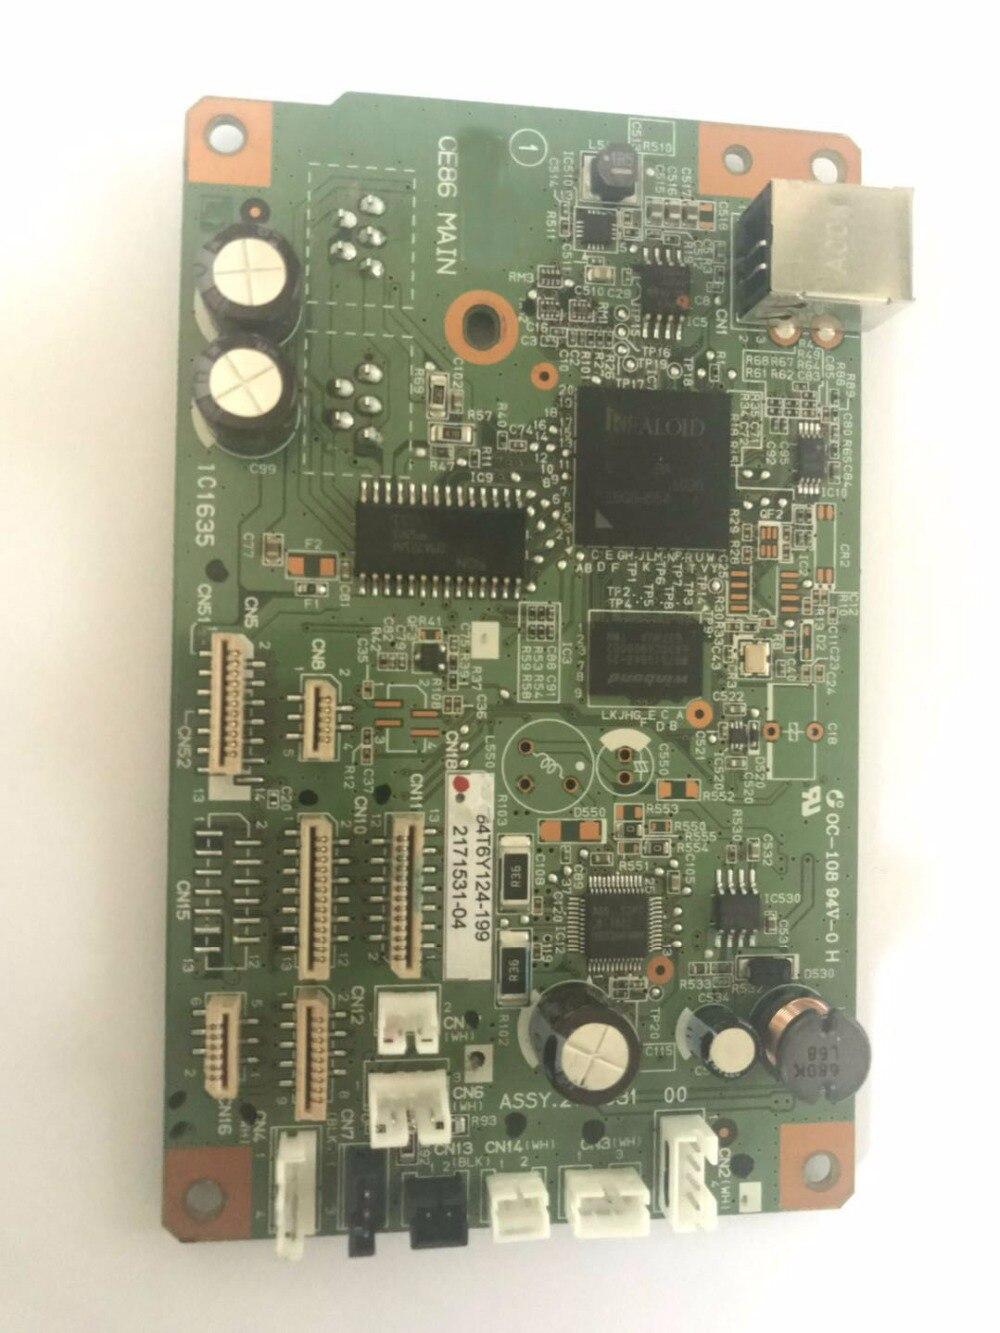 CE86 Formatter Board logic Main Board MainBoard mother board  for EPSON L805 805 formatter pca assy formatter board logic main board mainboard mother board for hp m775 m775dn m775f m775z m775z ce396 60001